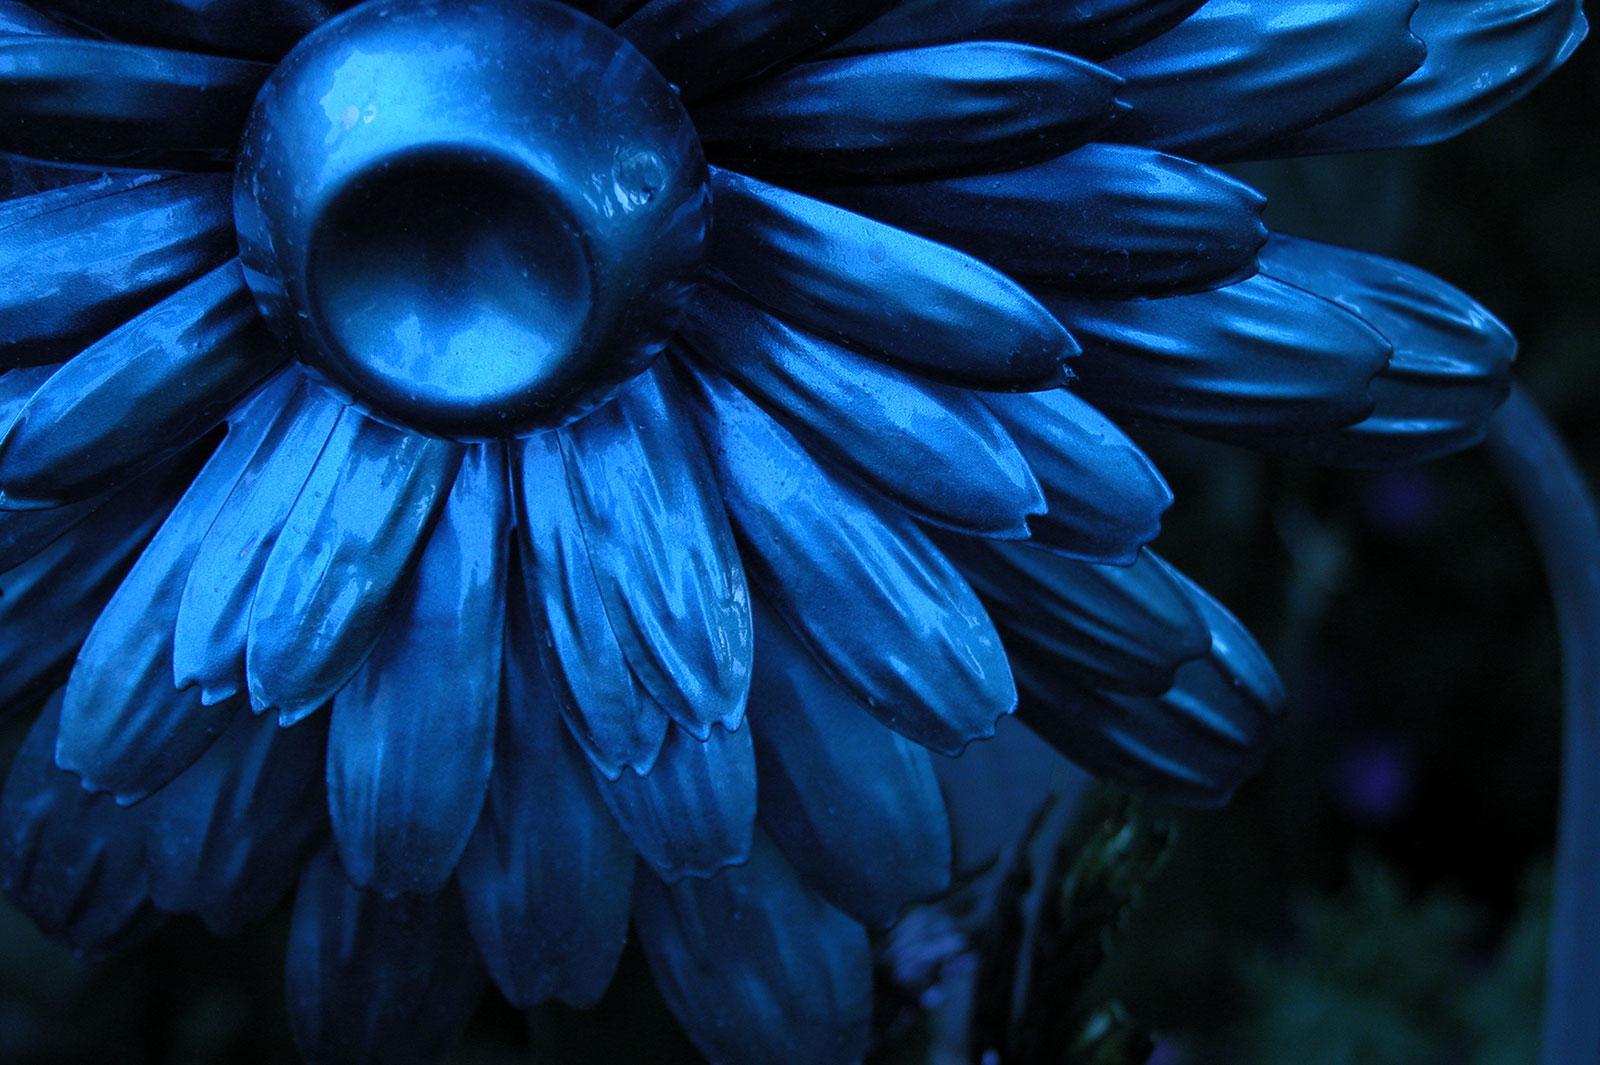 Monochromatic Paintings Of Flowers